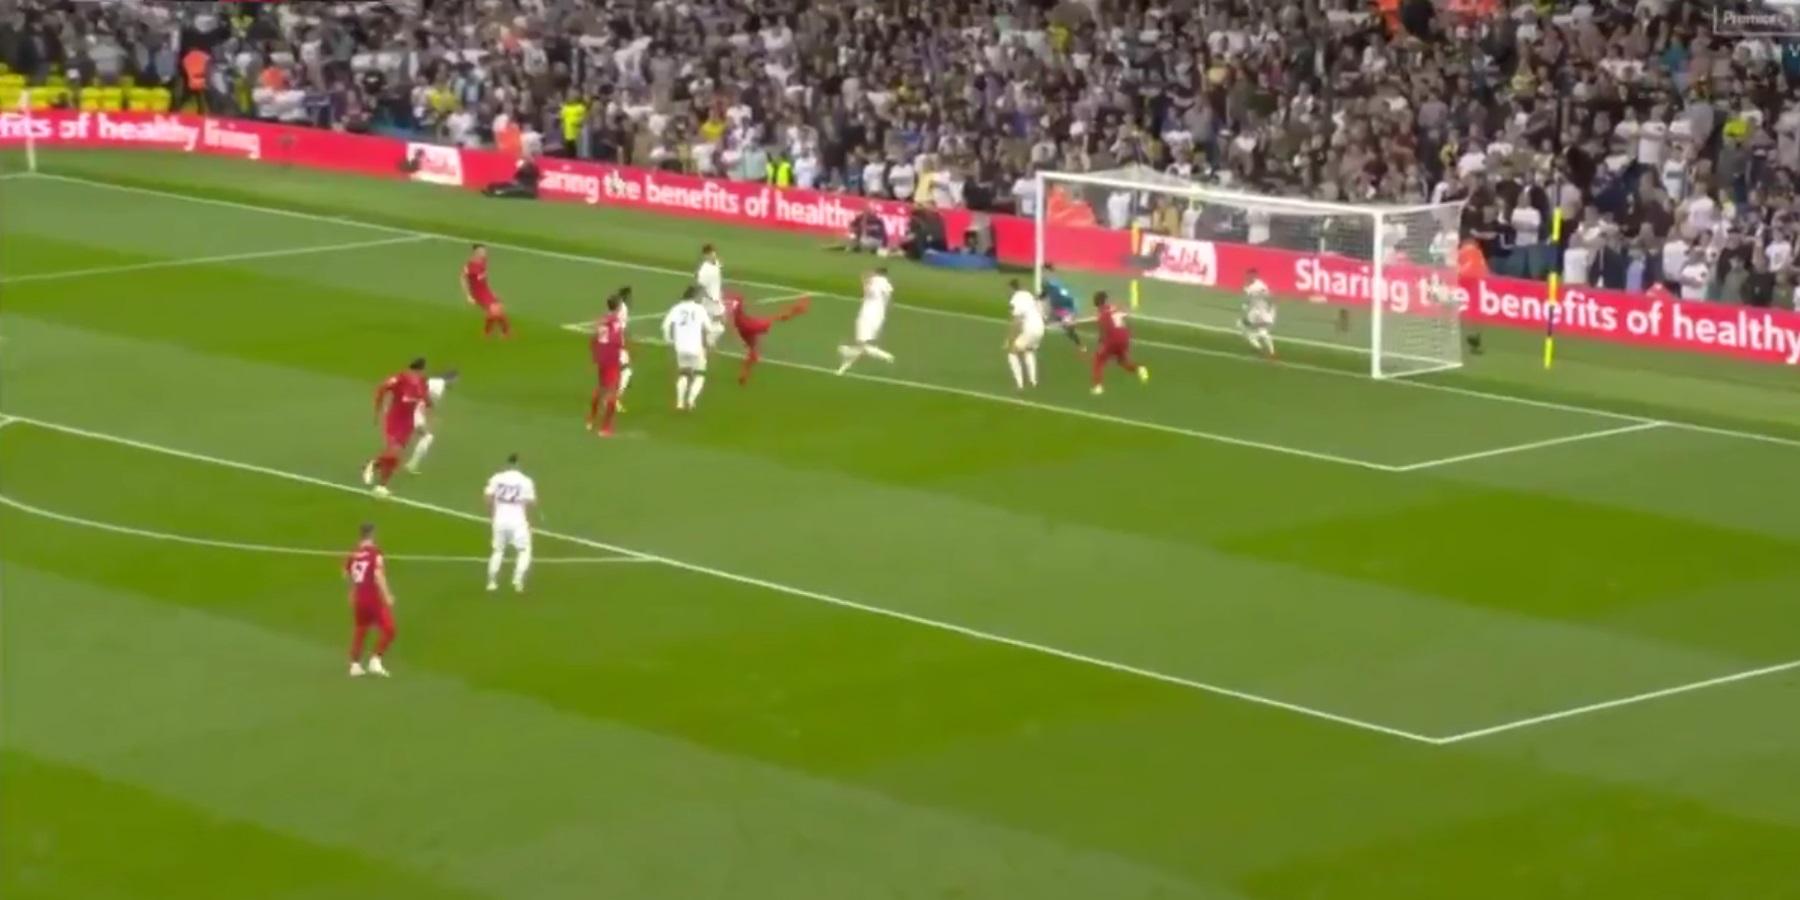 (Video) Fabinho doubles Liverpool's lead v. Leeds with rare goal